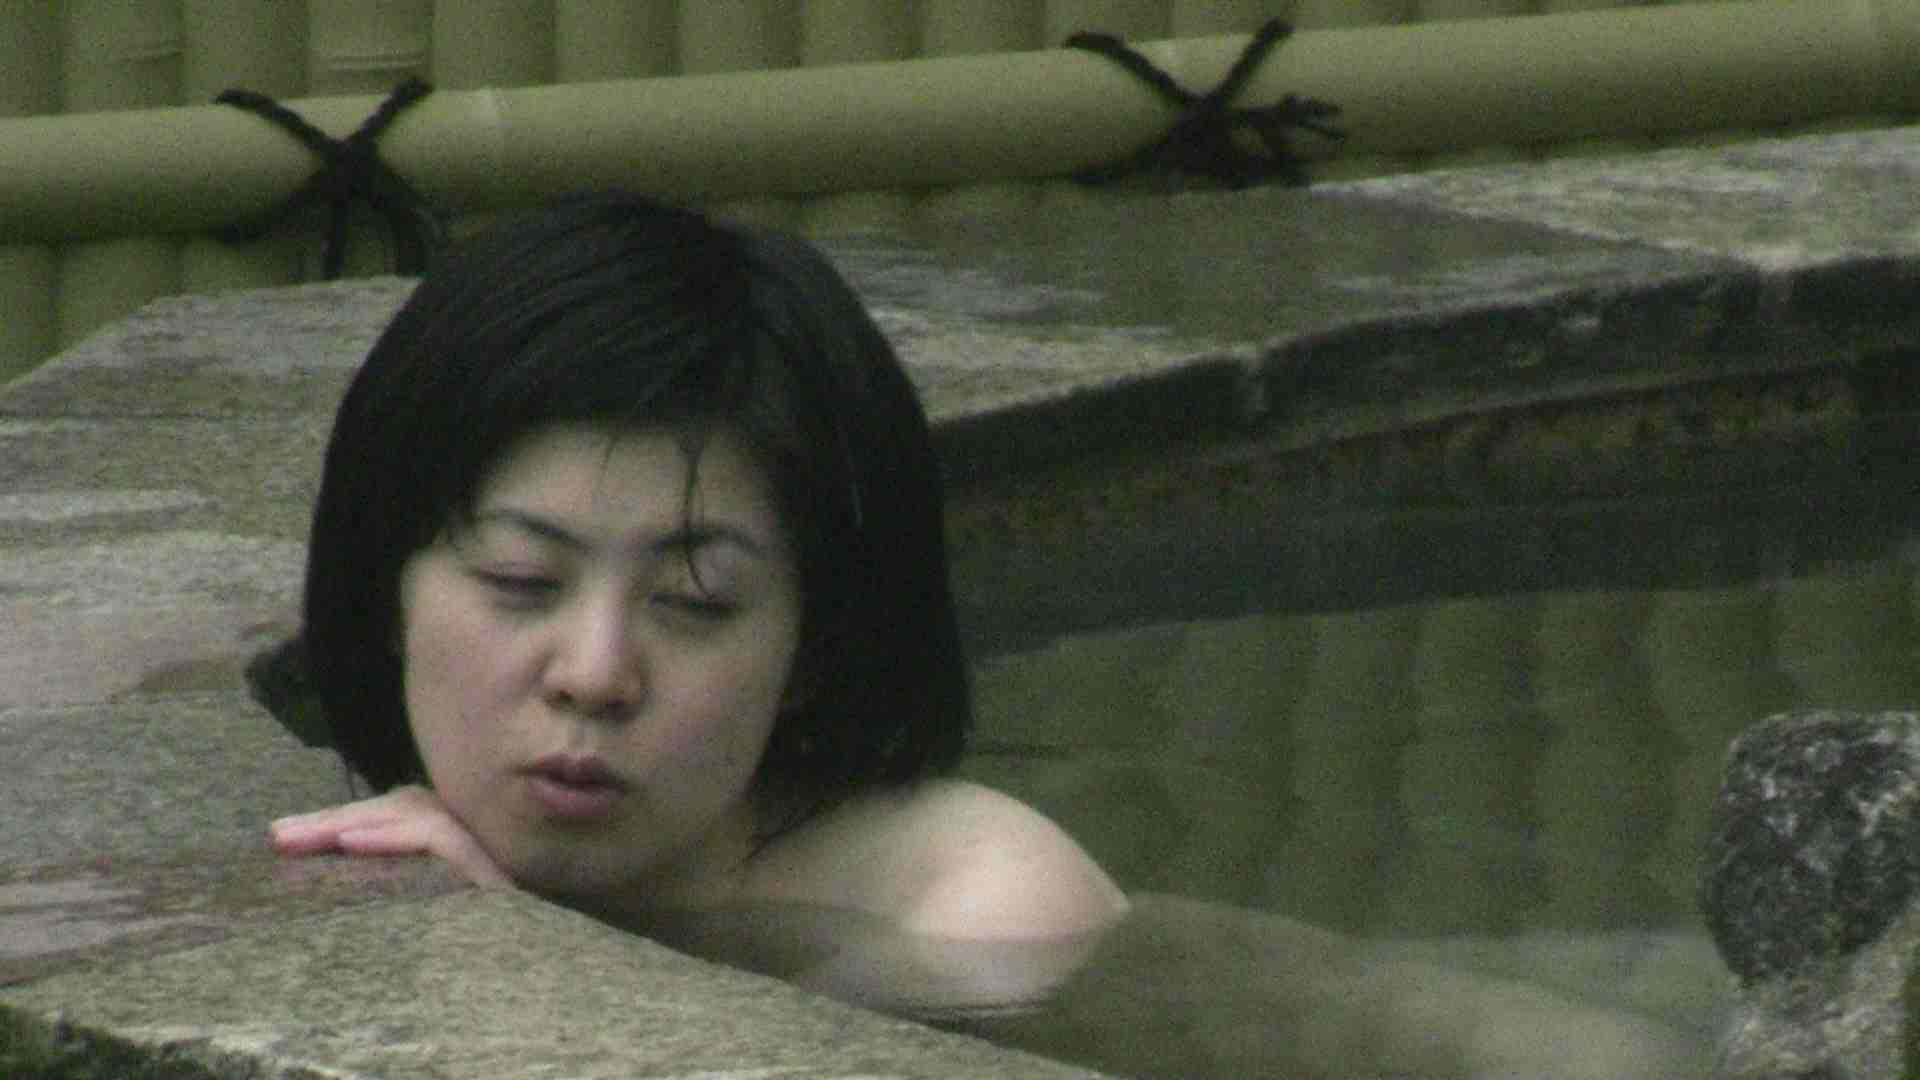 Aquaな露天風呂Vol.685 露天風呂突入 | 盗撮師作品  88pic 61